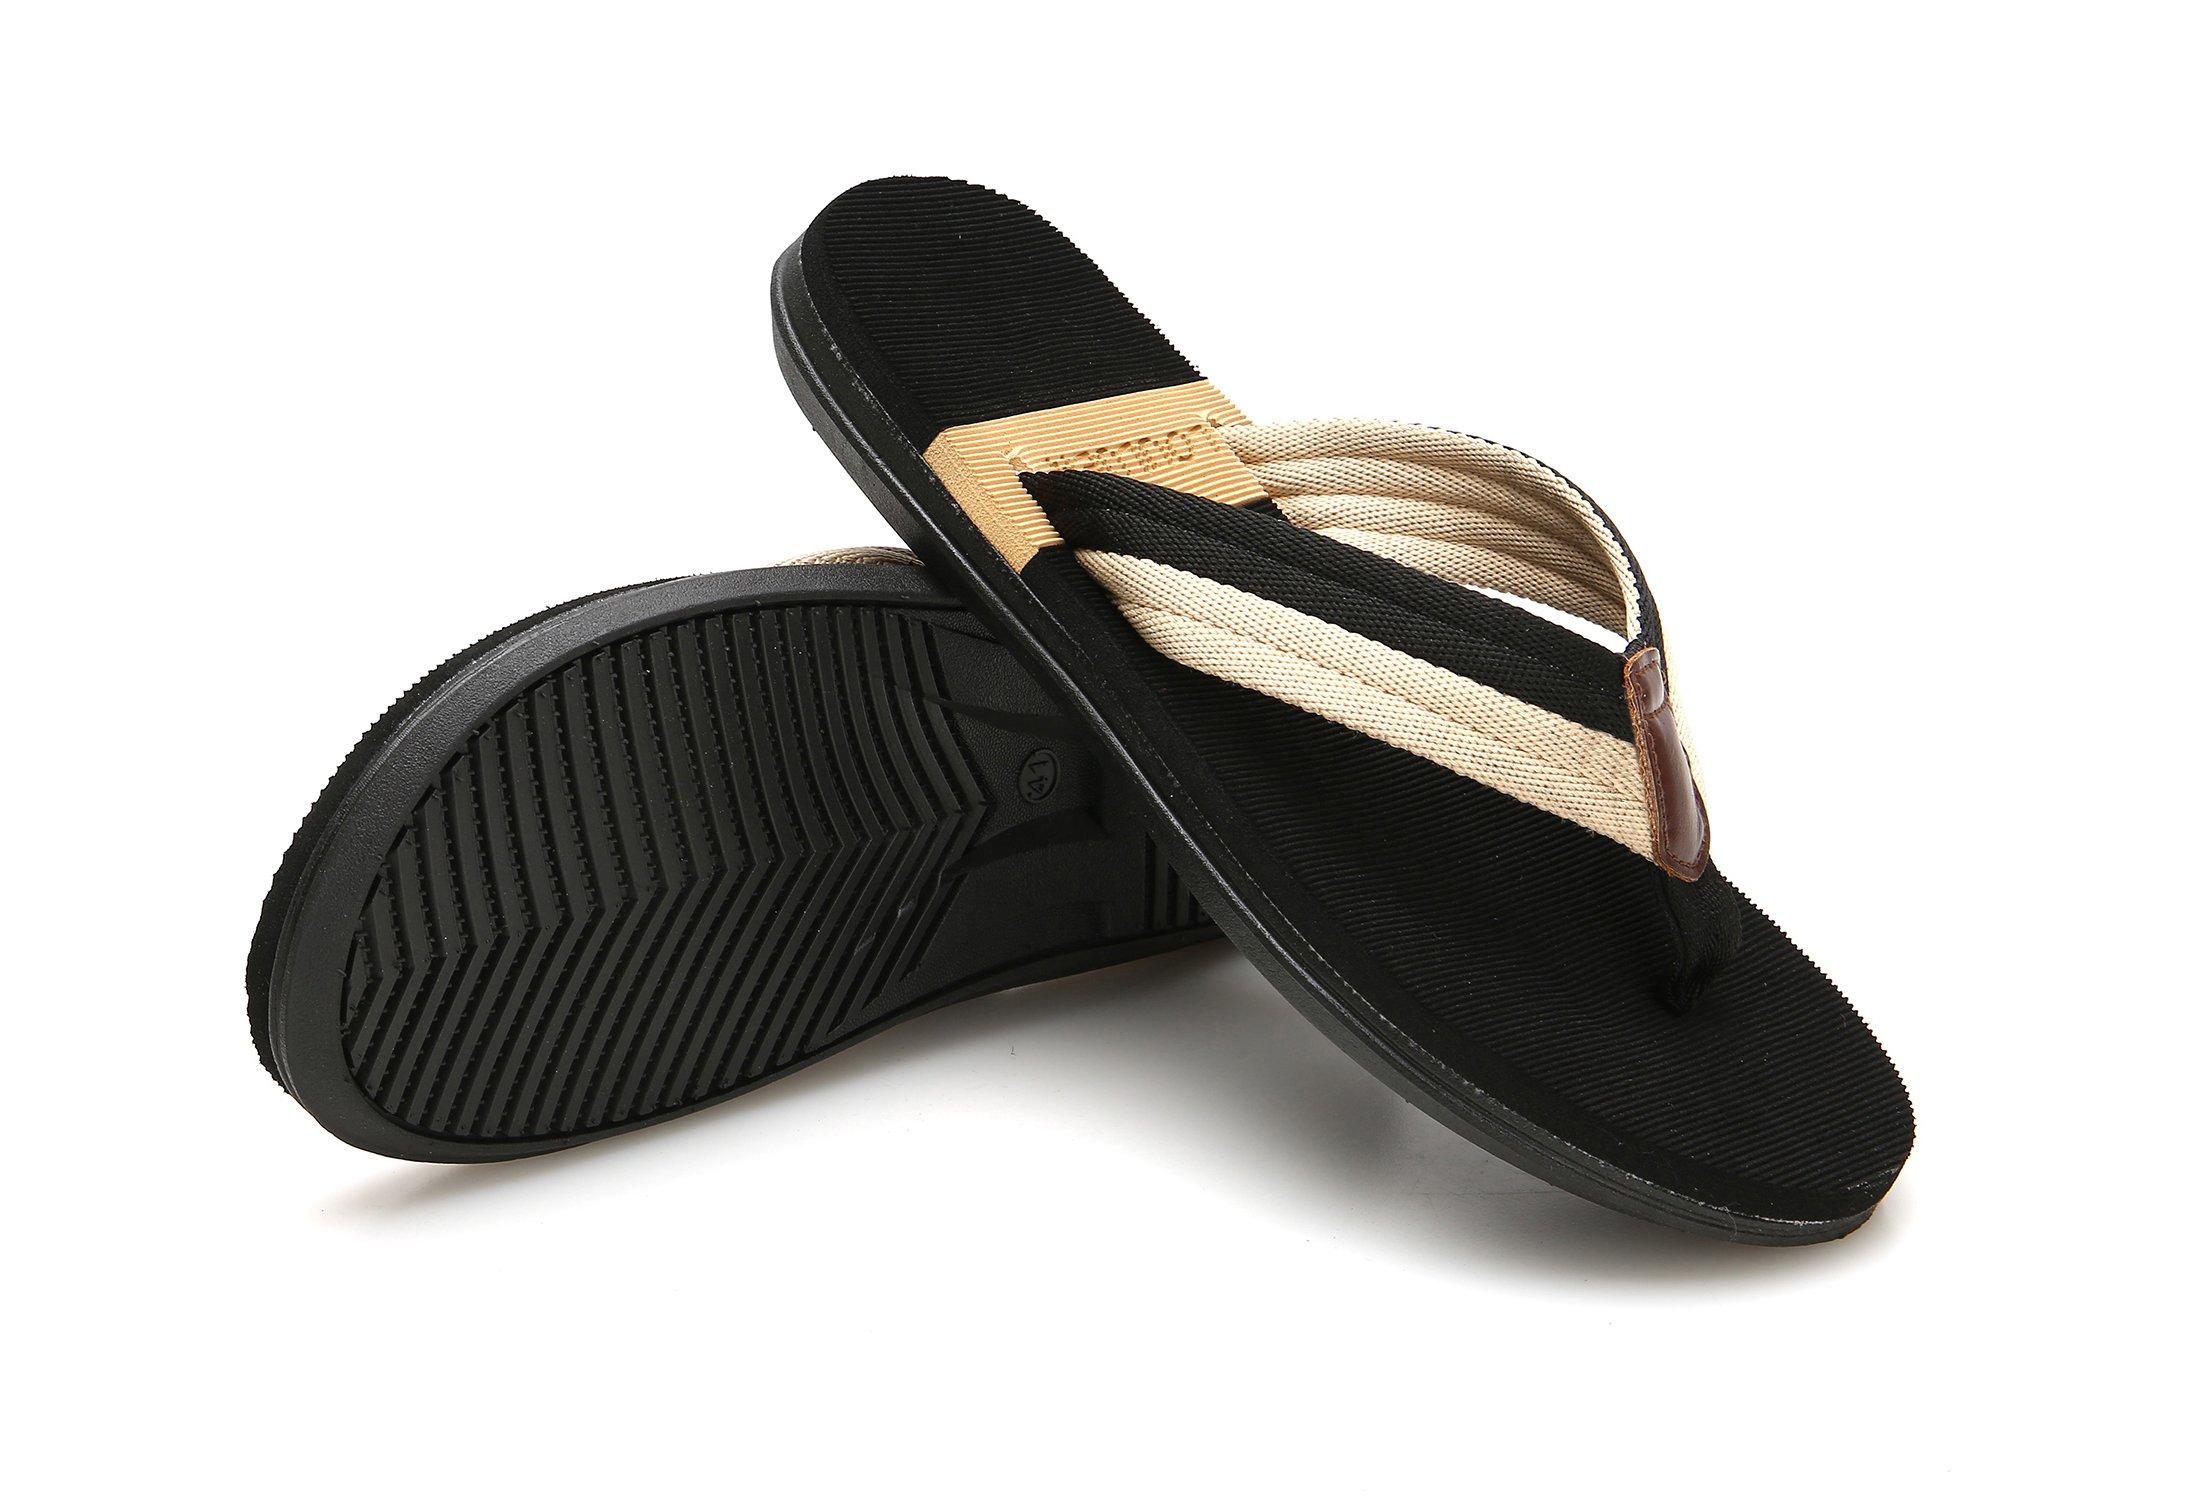 VIVWAY Men's Summer Beach Flip-Flops Thongs Flexible Fashion Sandals Classical Lightweight Non-Slip Black Slippers US10